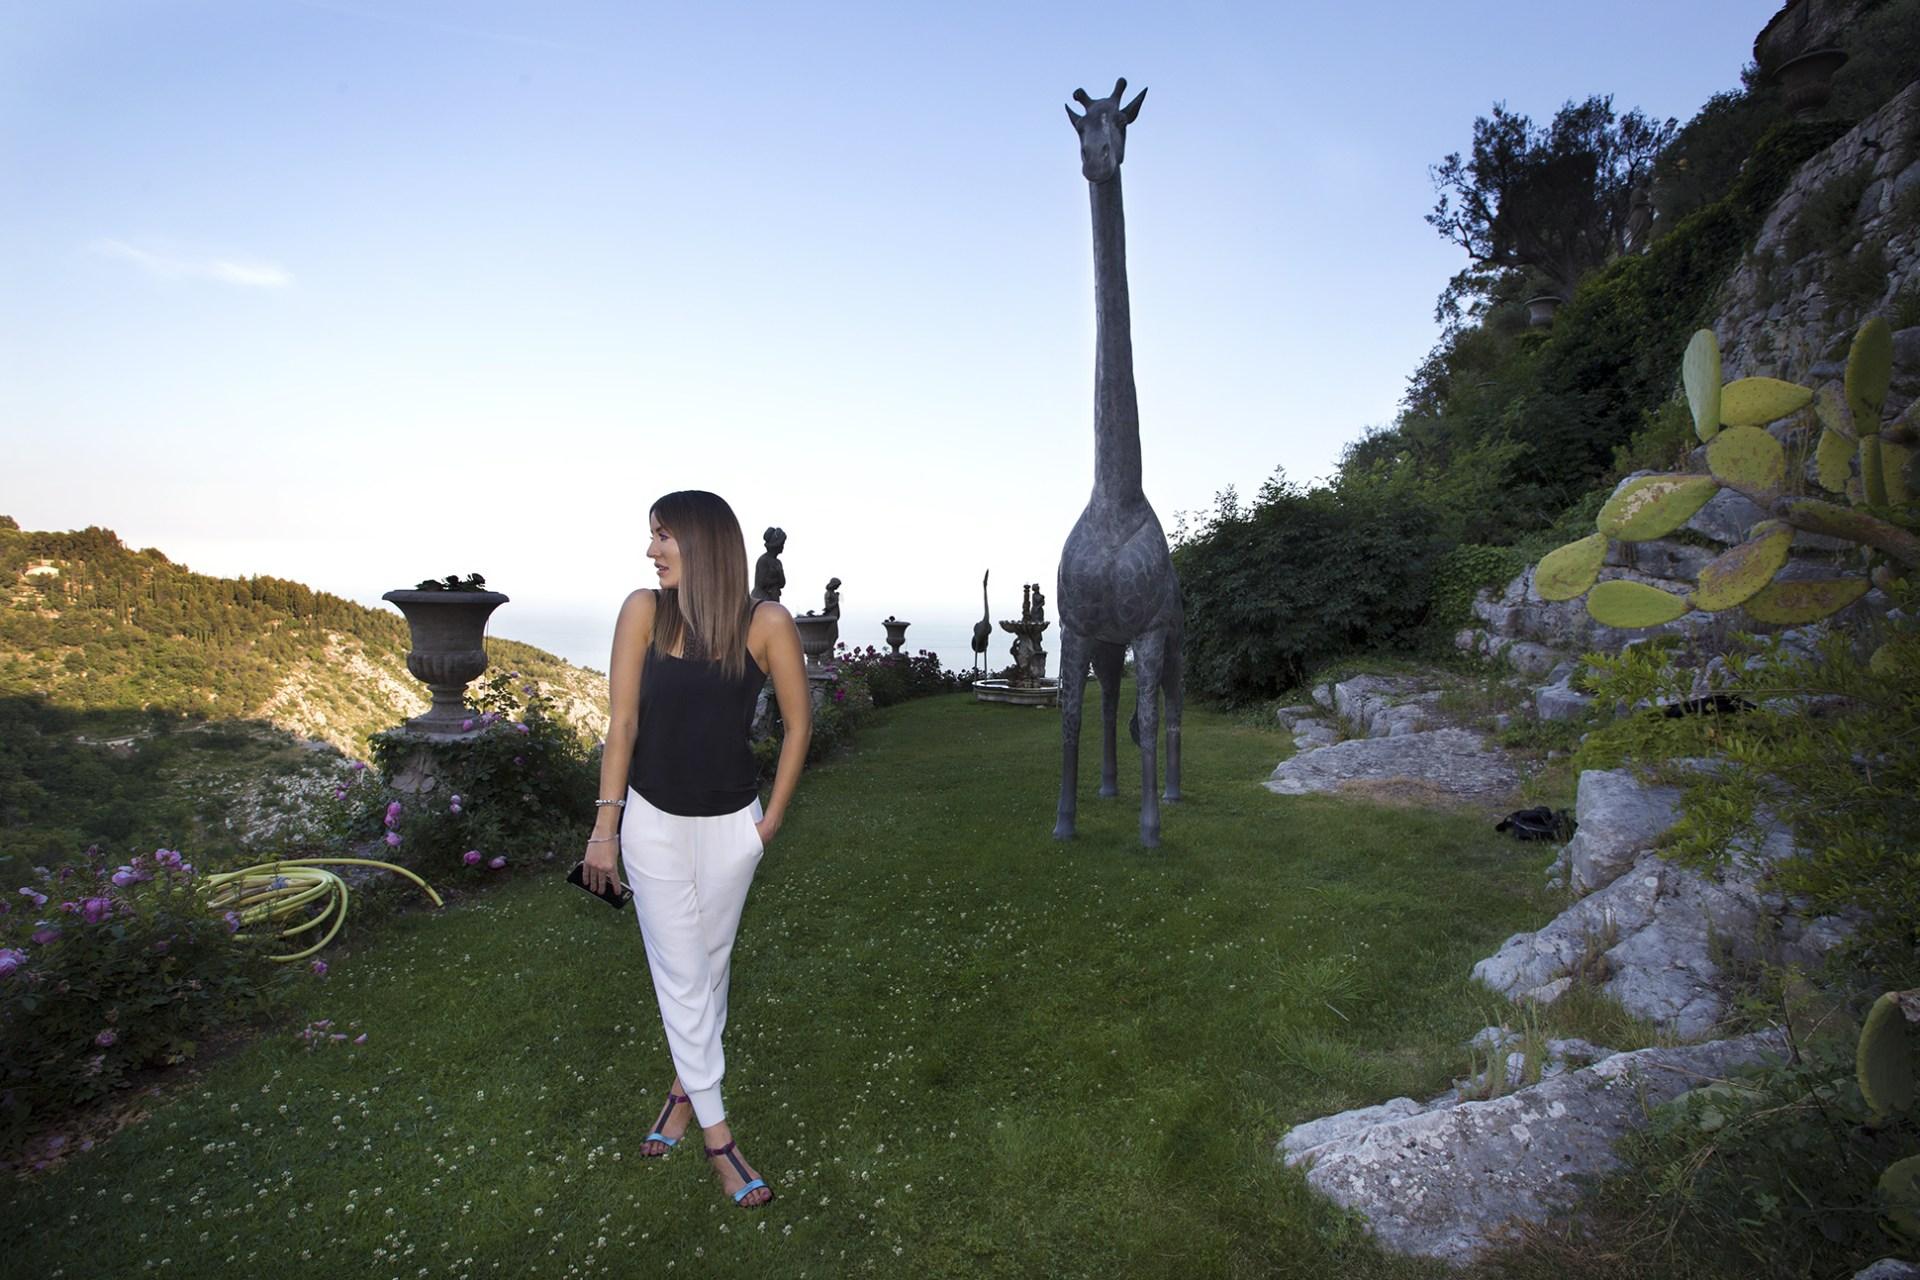 The gardens and giraffe sculptures of Chateau de la Chèvre d'or